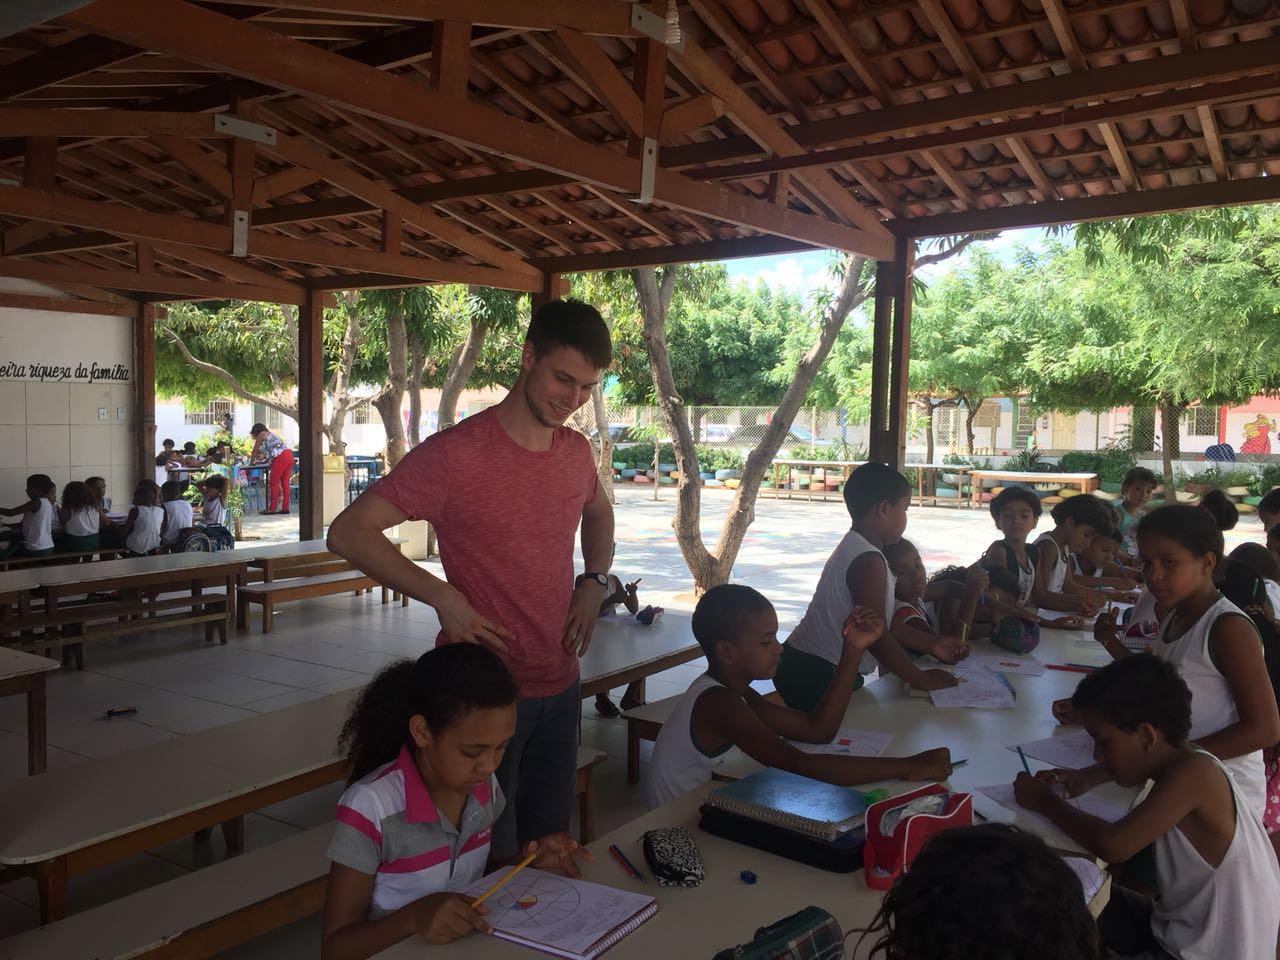 Gira Mundo | Creativity and Education | Brazil (September)